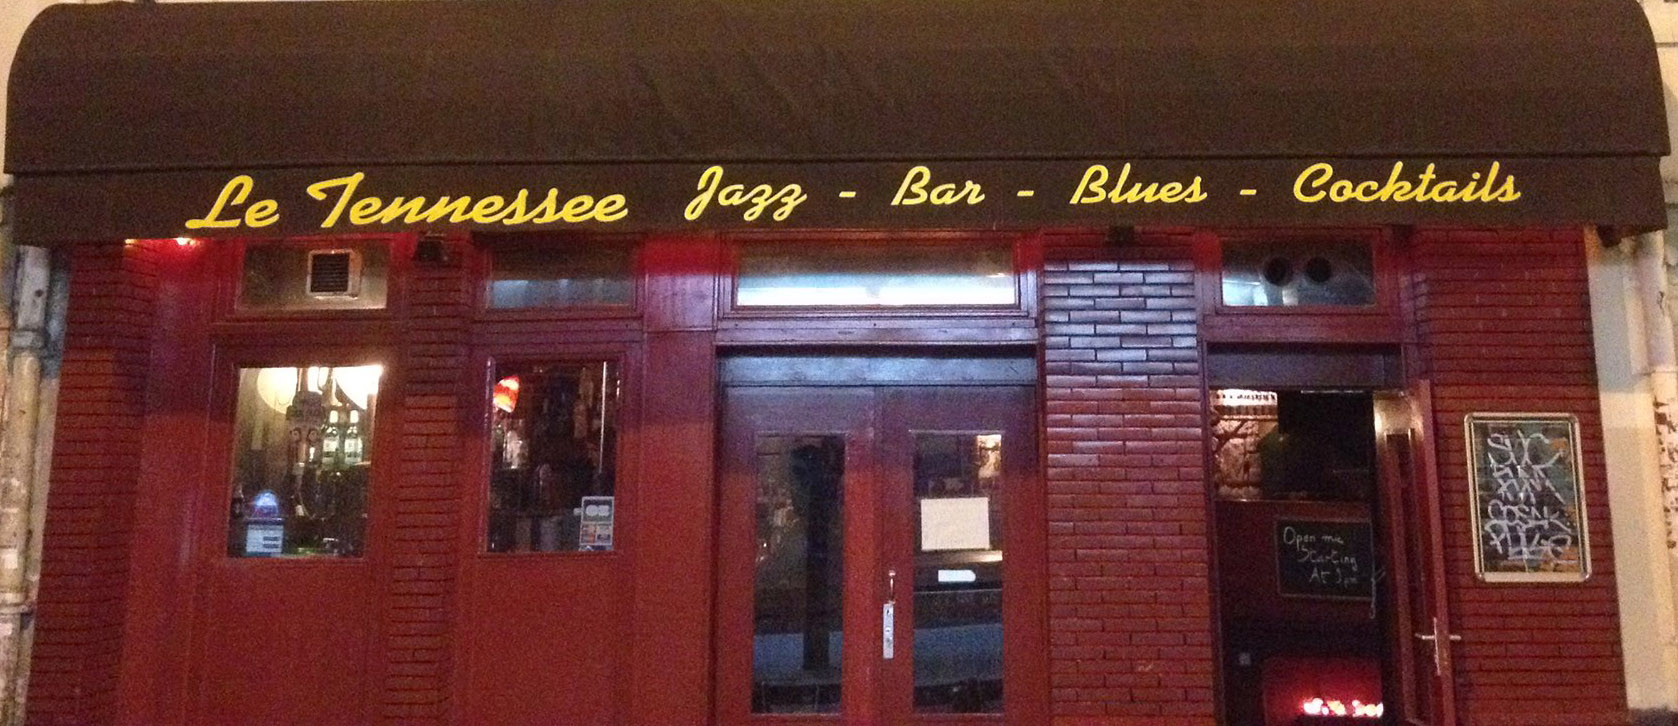 Tennessee Jazz Bar | Paris | MyCityHighlight